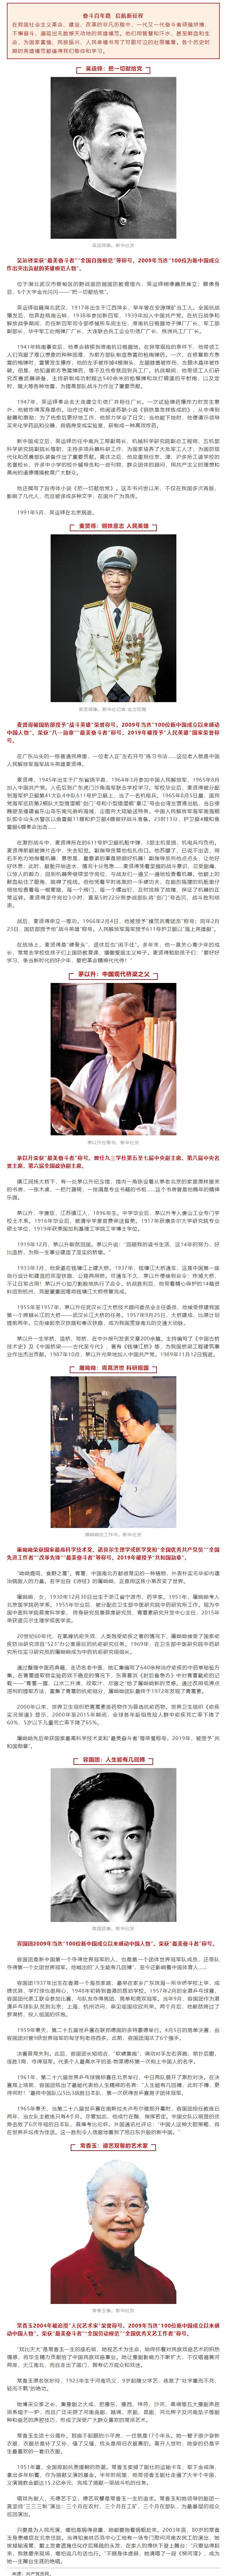 FireShot Capture 212 - 数风流人物 - 榜样的力量绽放光芒 - mp.weixin.qq.com.png